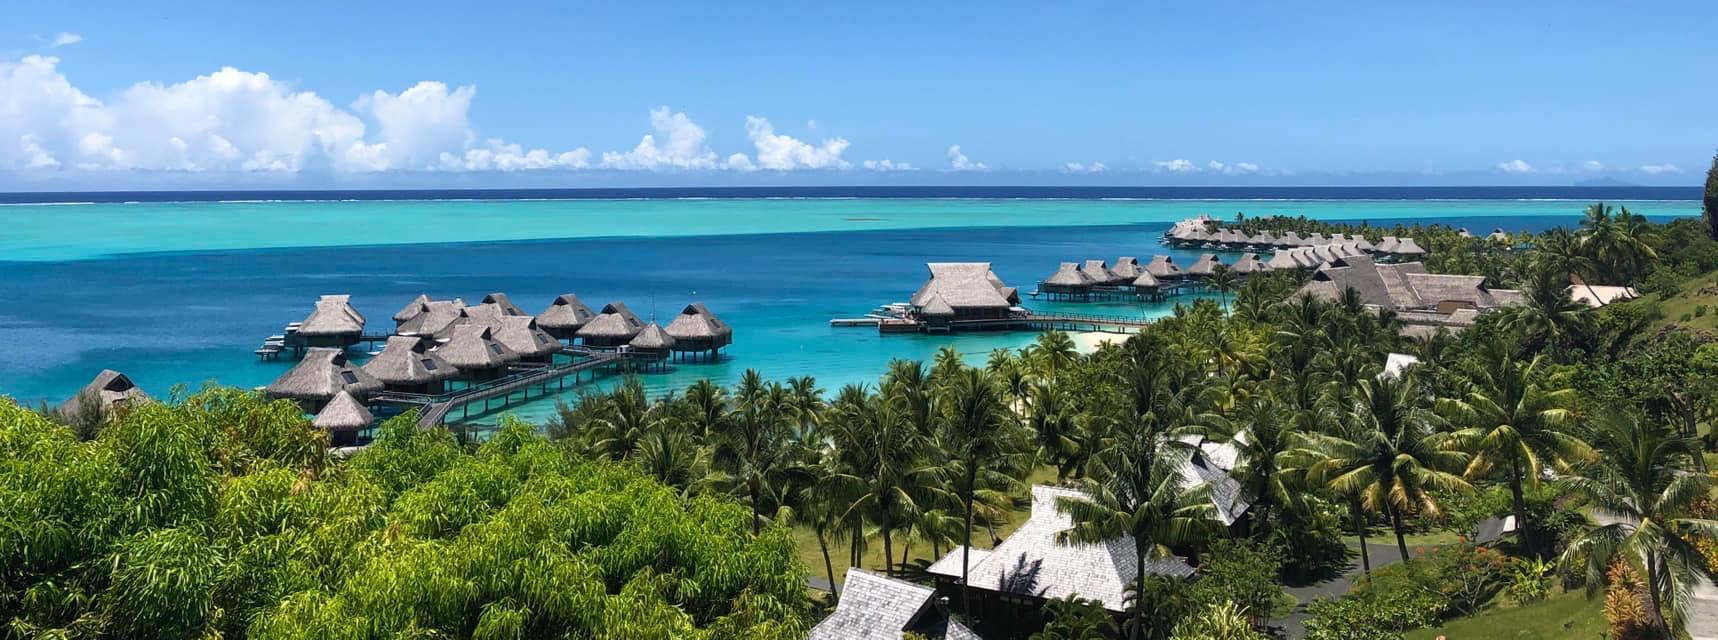 over water bungalows conrad resort Bora Bora